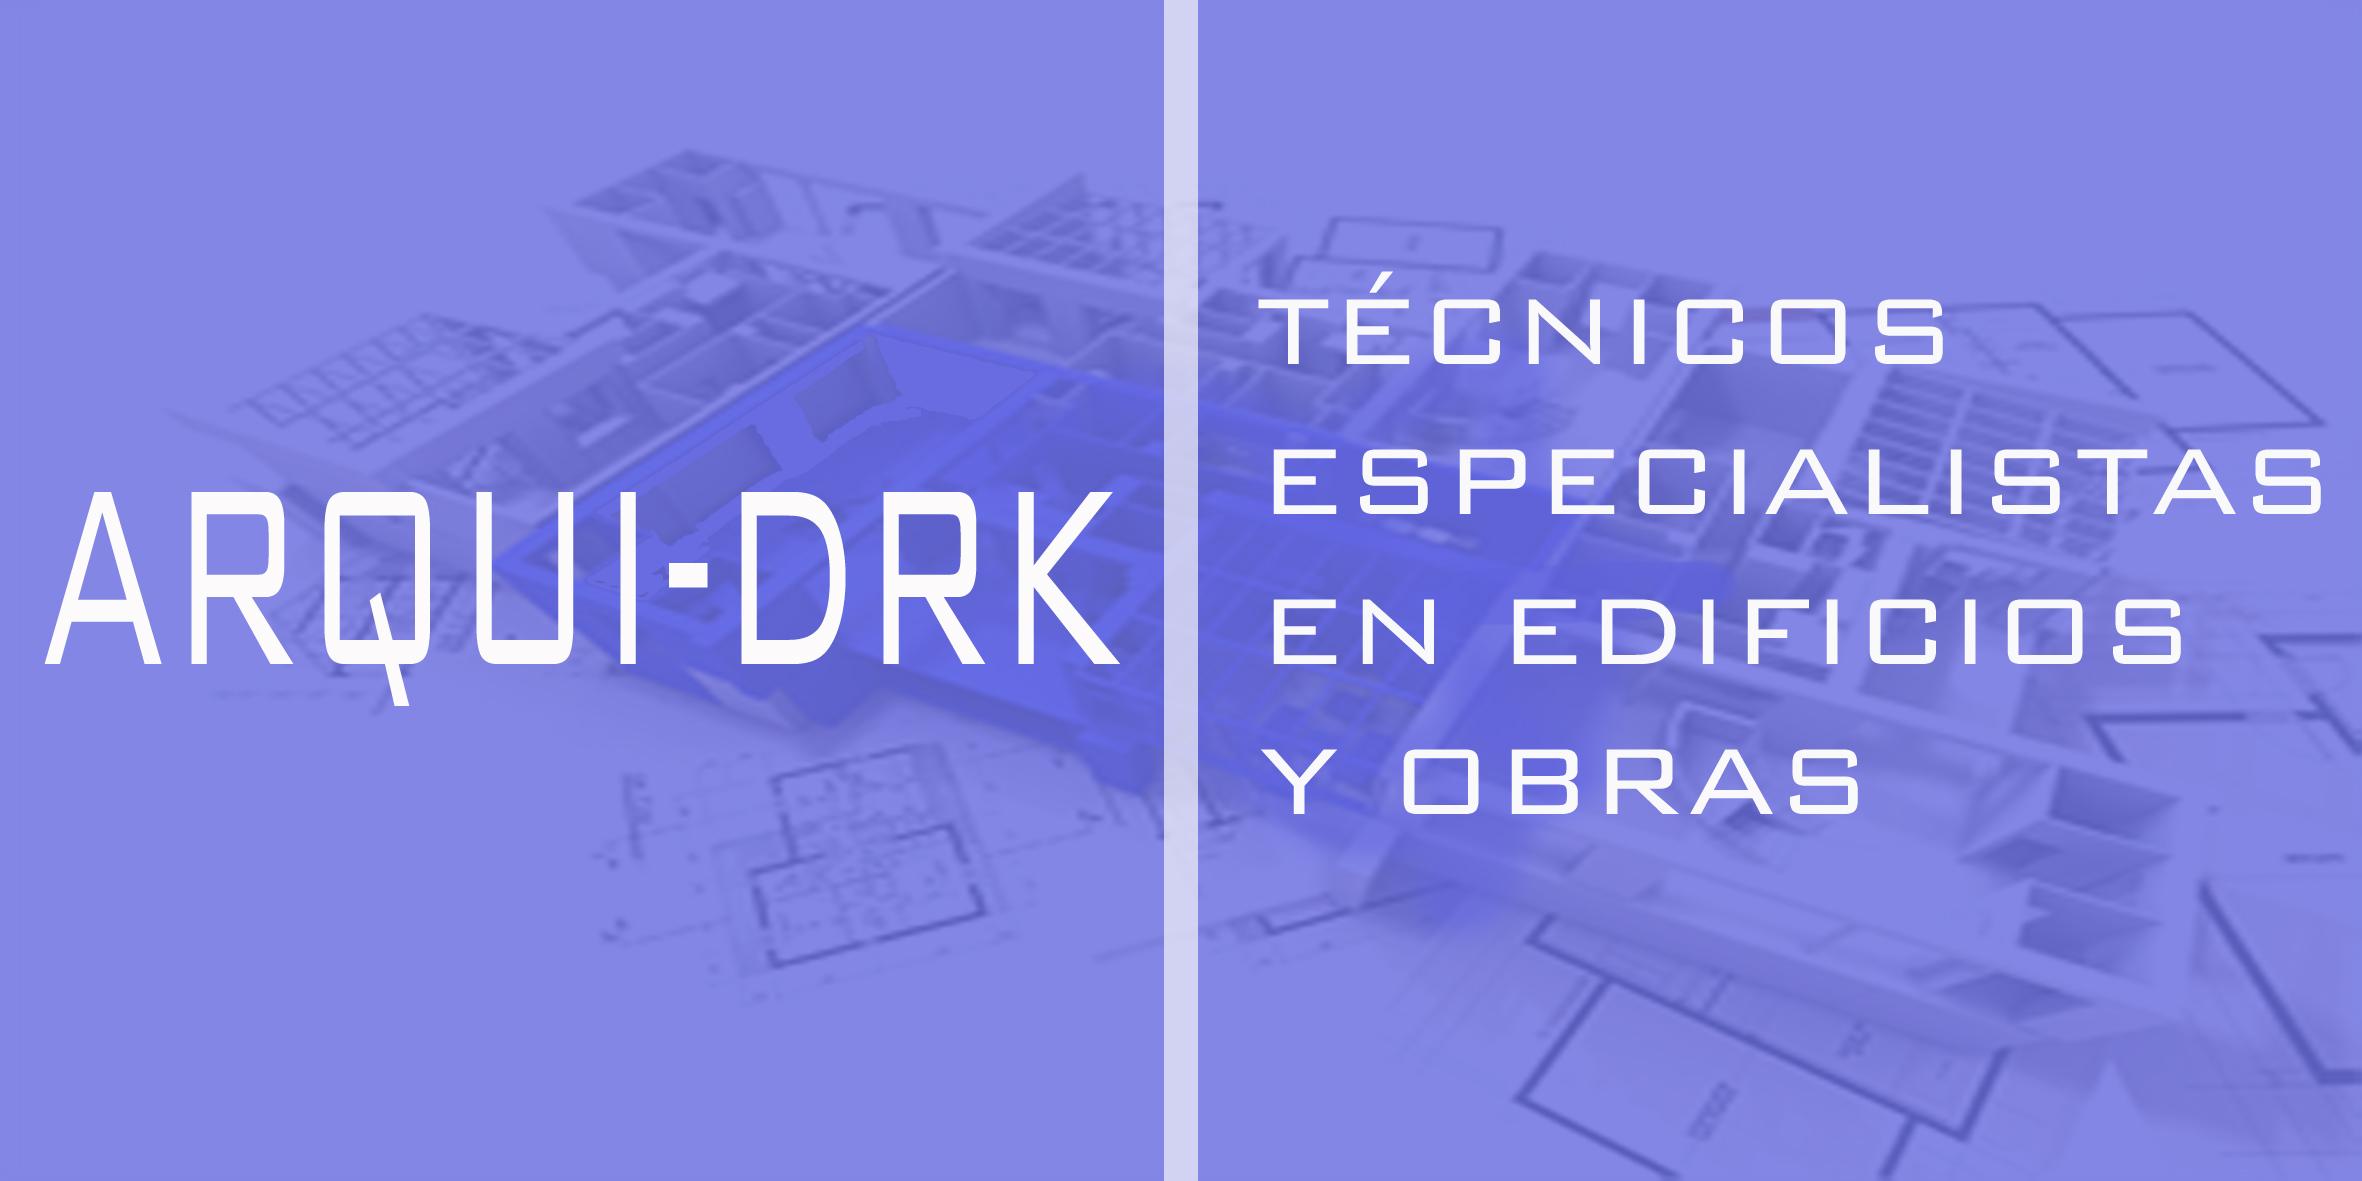 Arqui-drk